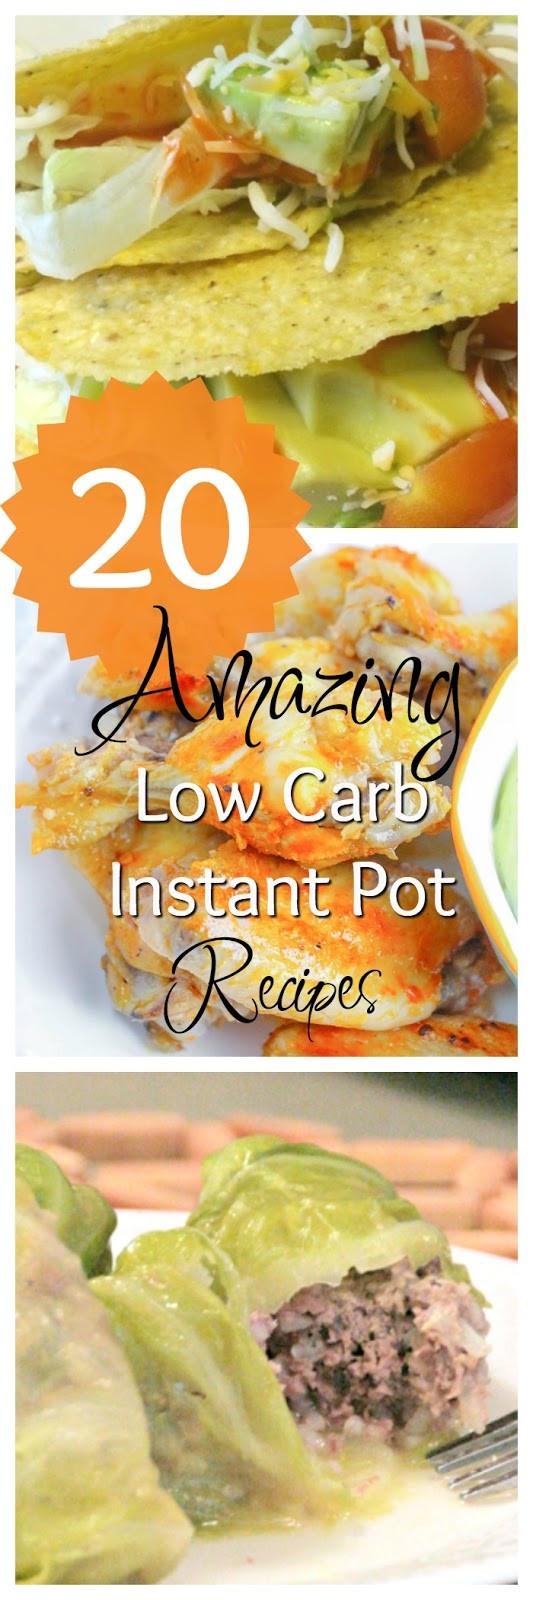 Instant Pot Diabetic Recipes  20 of the Most AMAZING Low Carb Instant Pot Recipes We